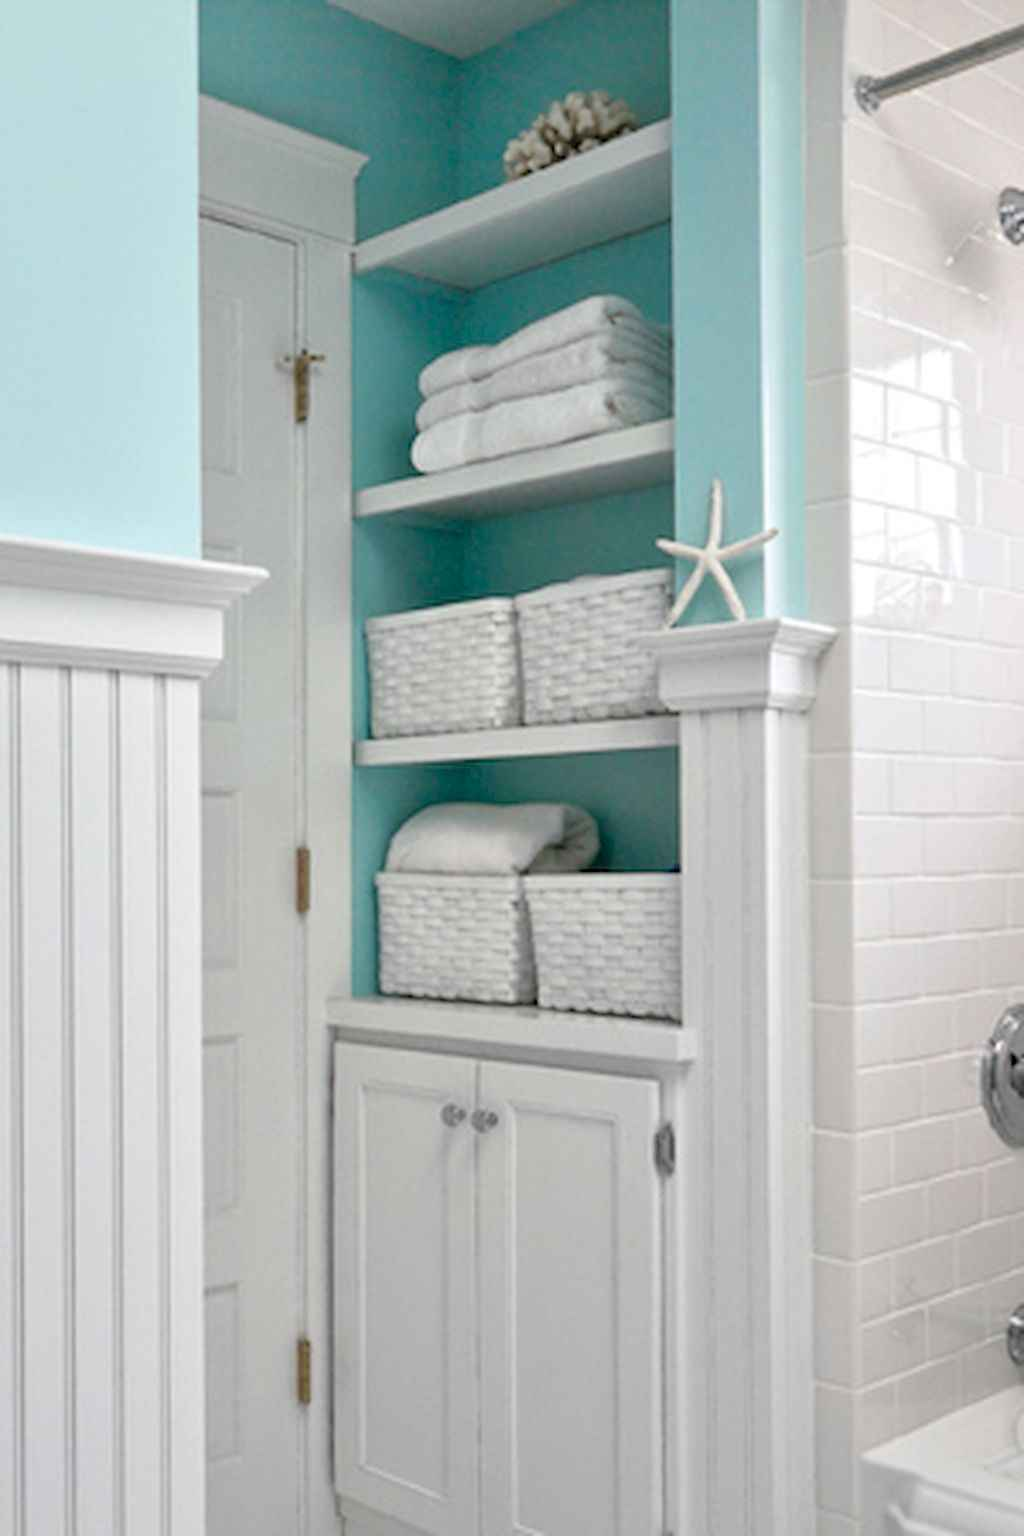 Cool bathroom storage shelves organization ideas (31)